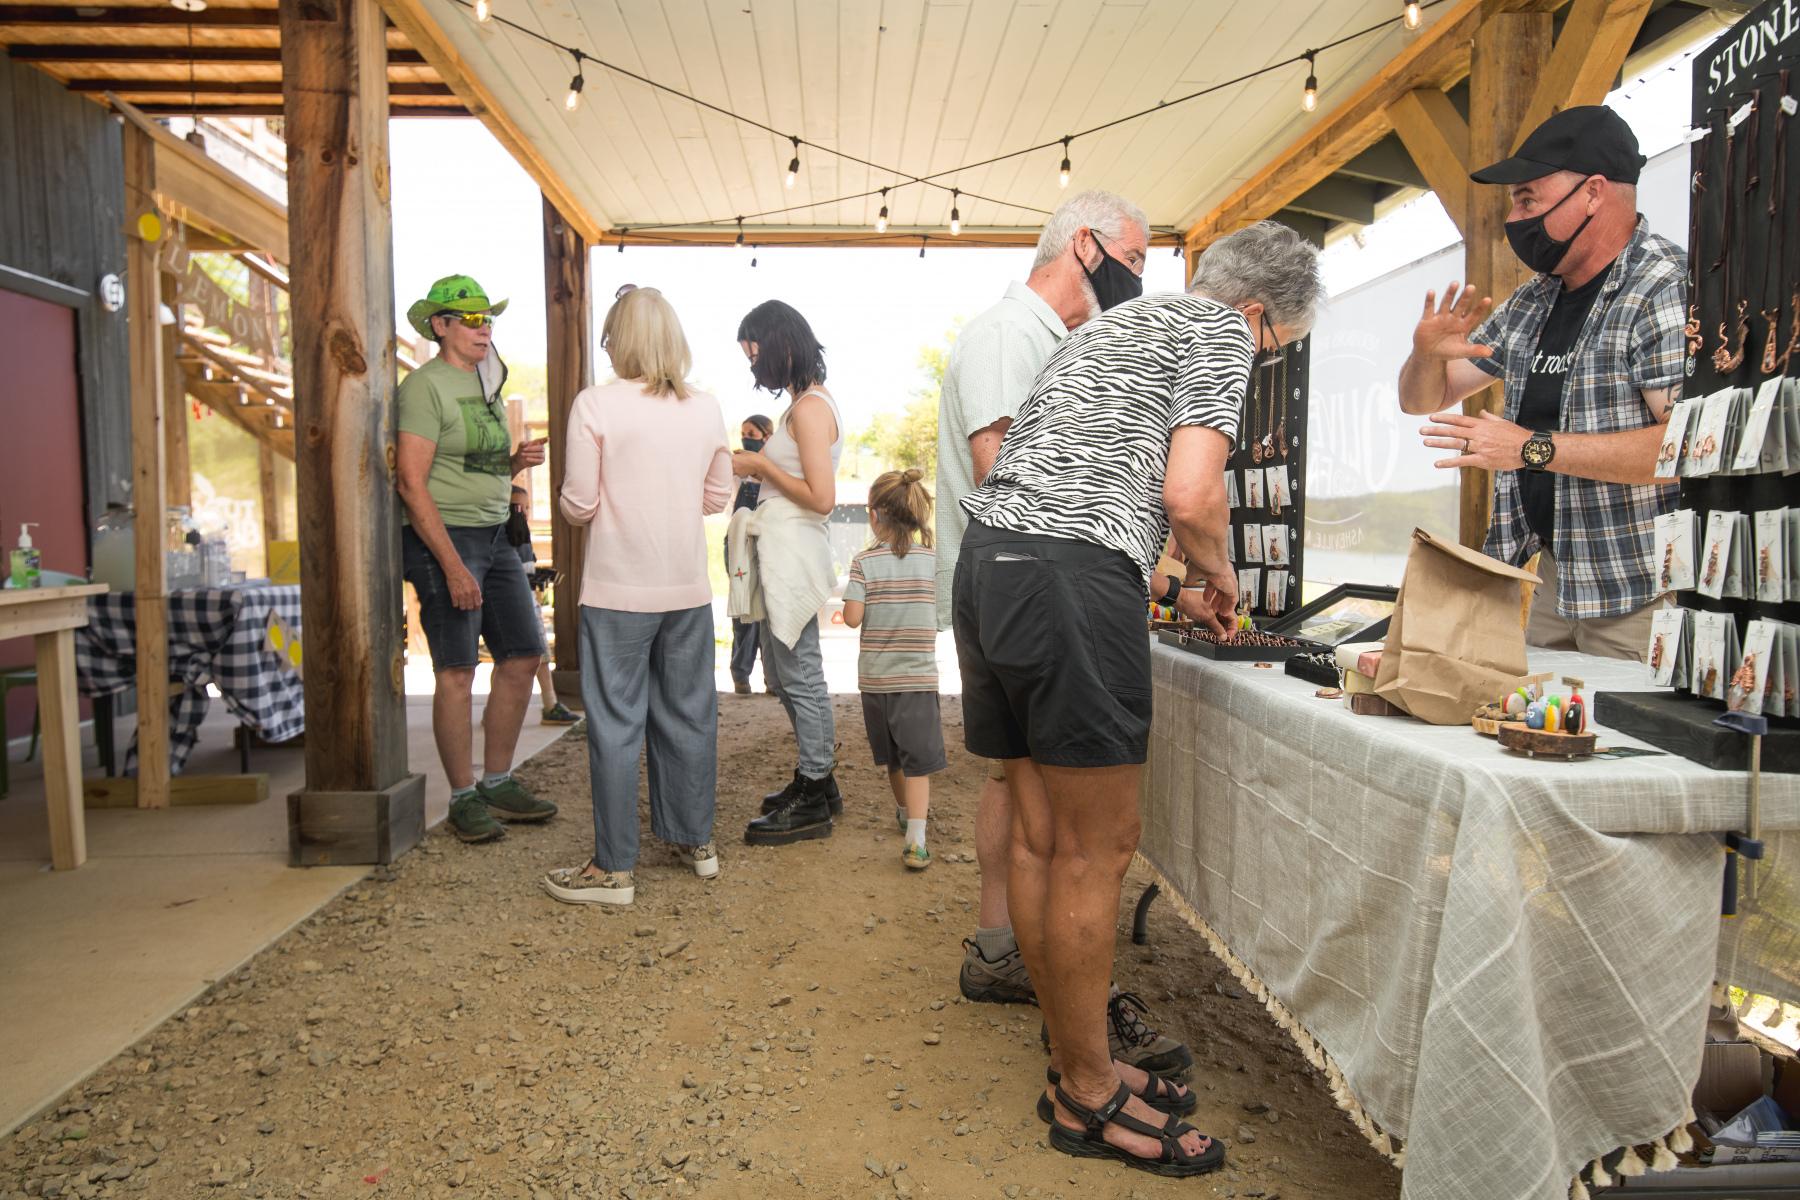 Stephan-Pruitt-Photography-Olivette-Farmers-Market-7